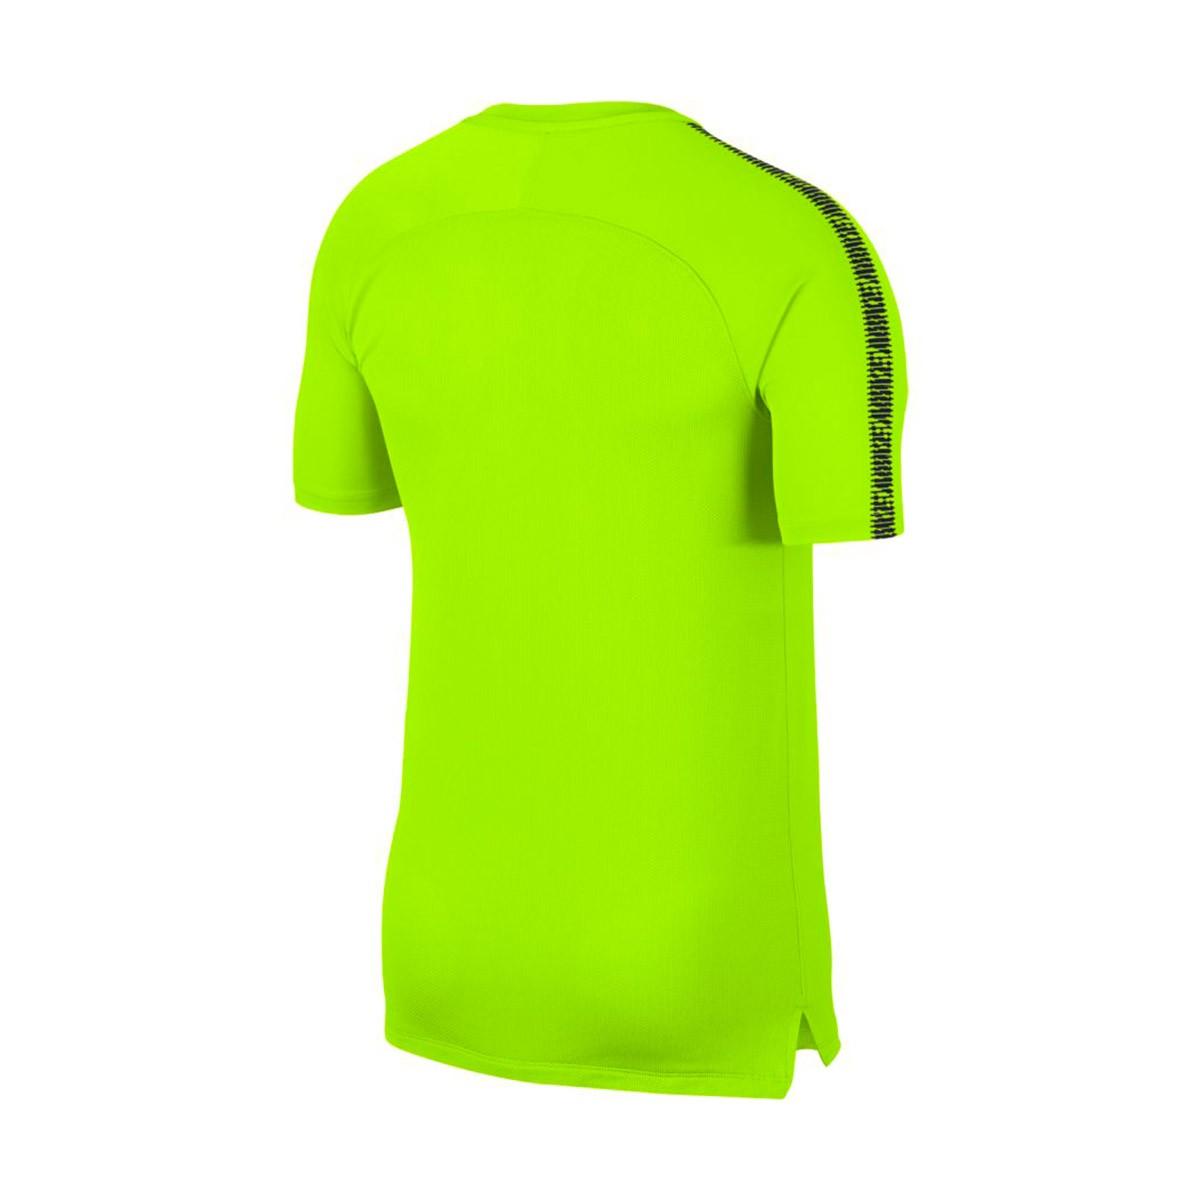 31905a944 Jersey Nike Breathe Squad Top SS Neymar Volt-Black - Tienda de ...